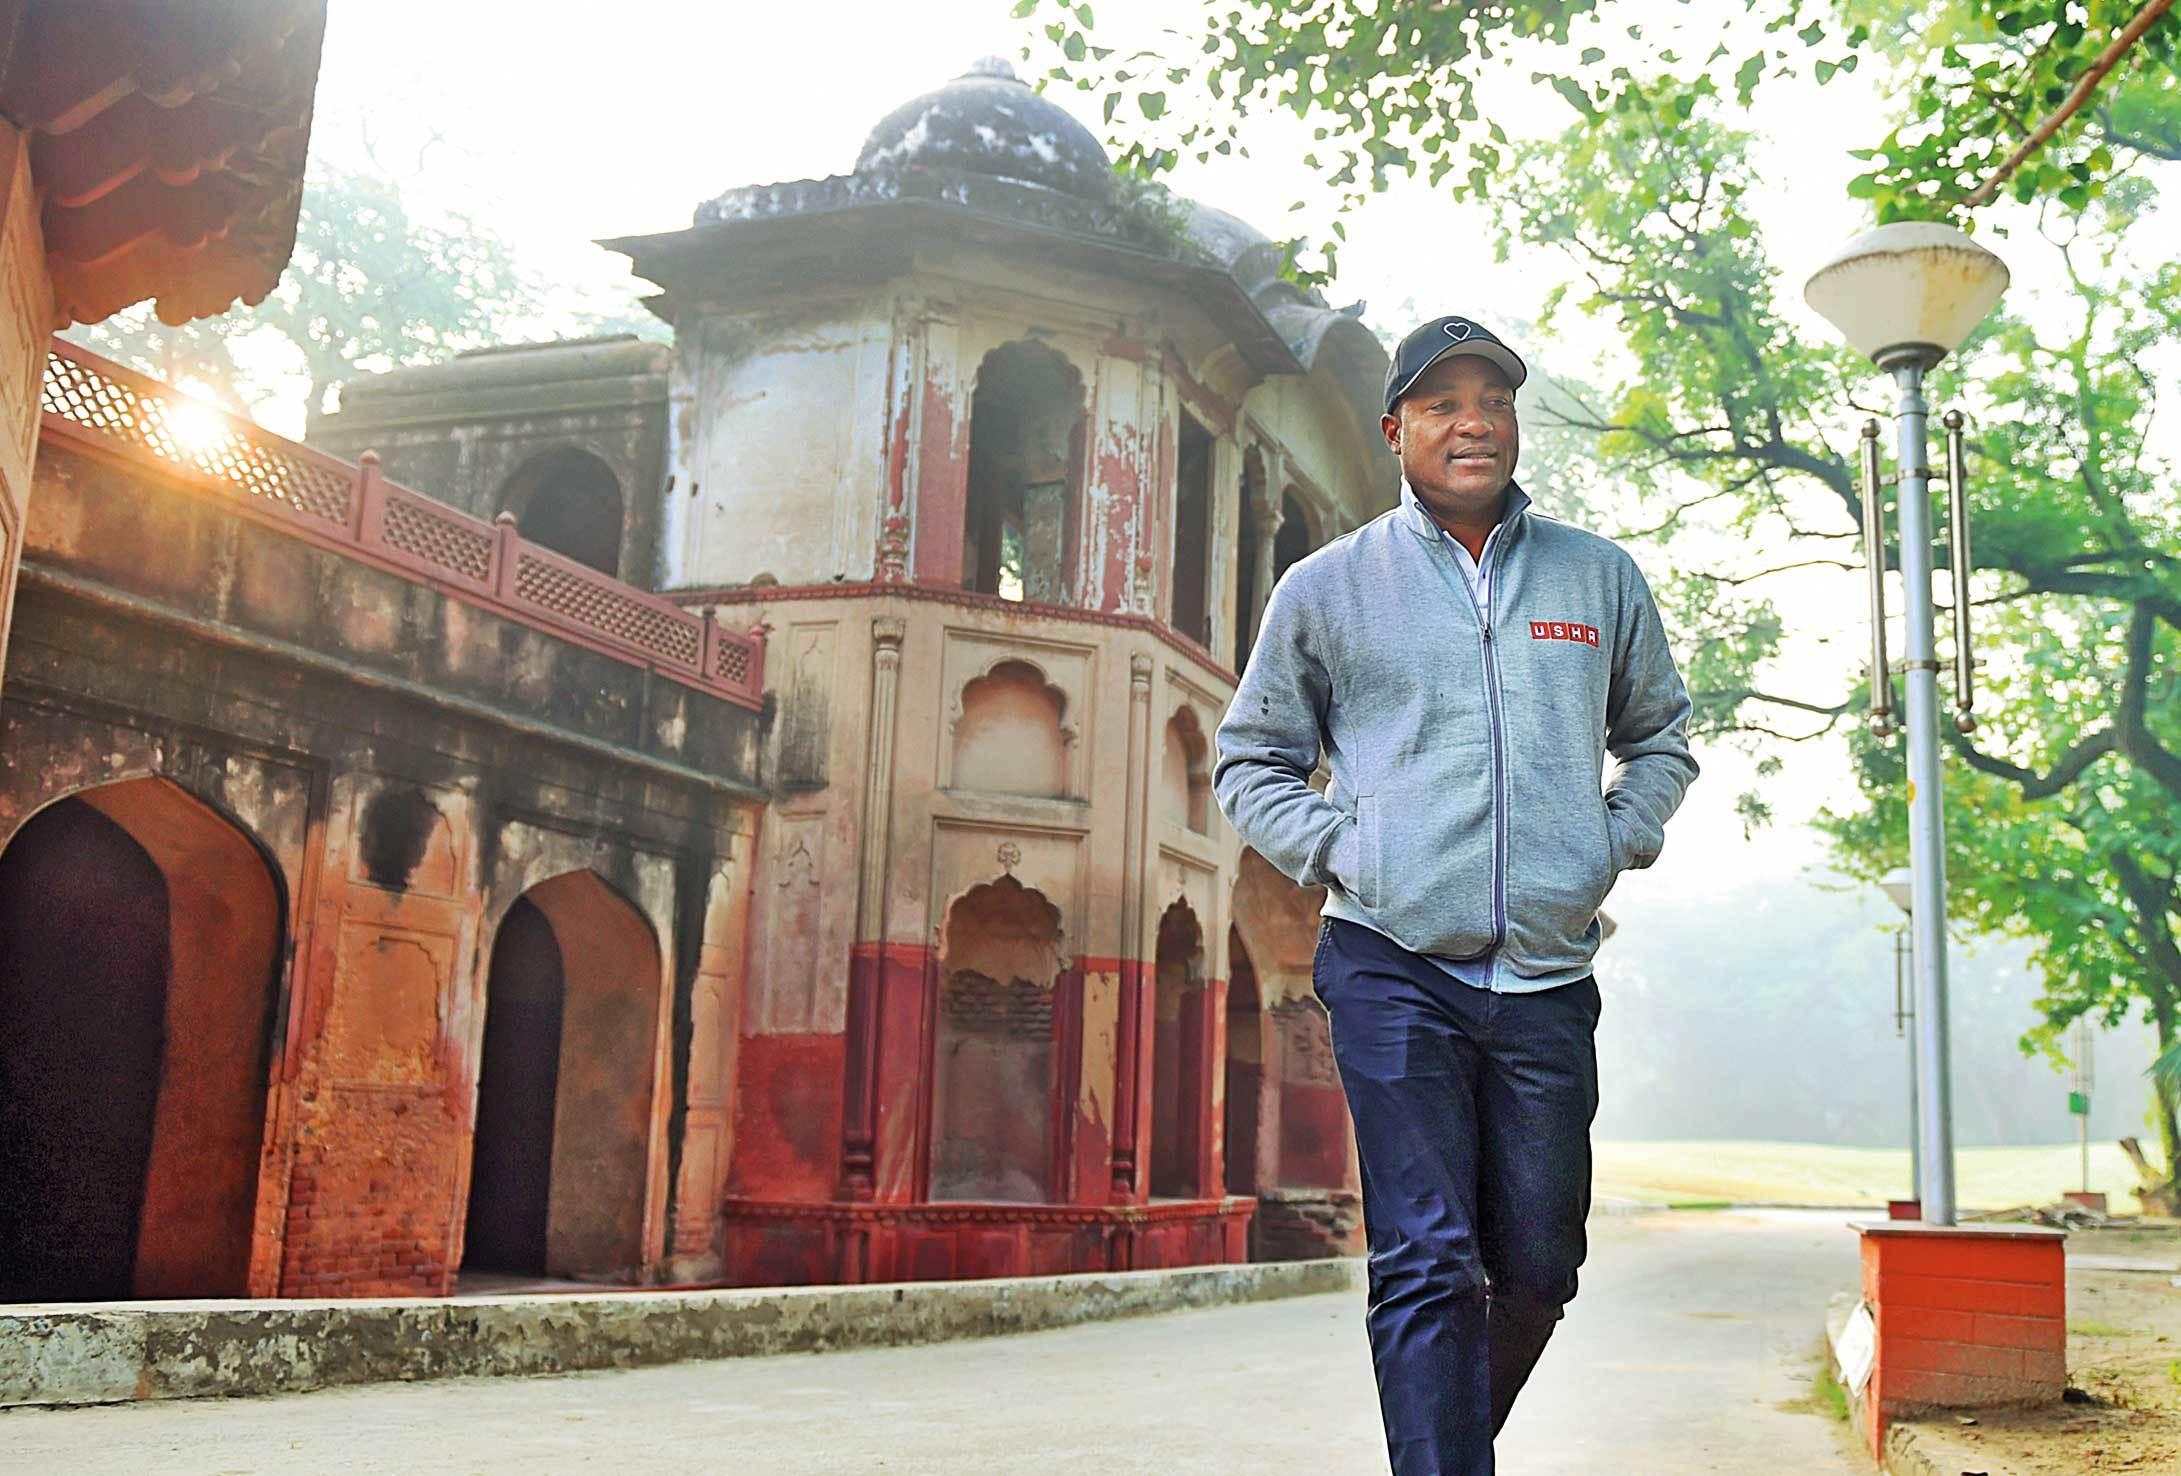 Beating the Field: Legendary cricketer Brian Lara at Delhi Golf Course